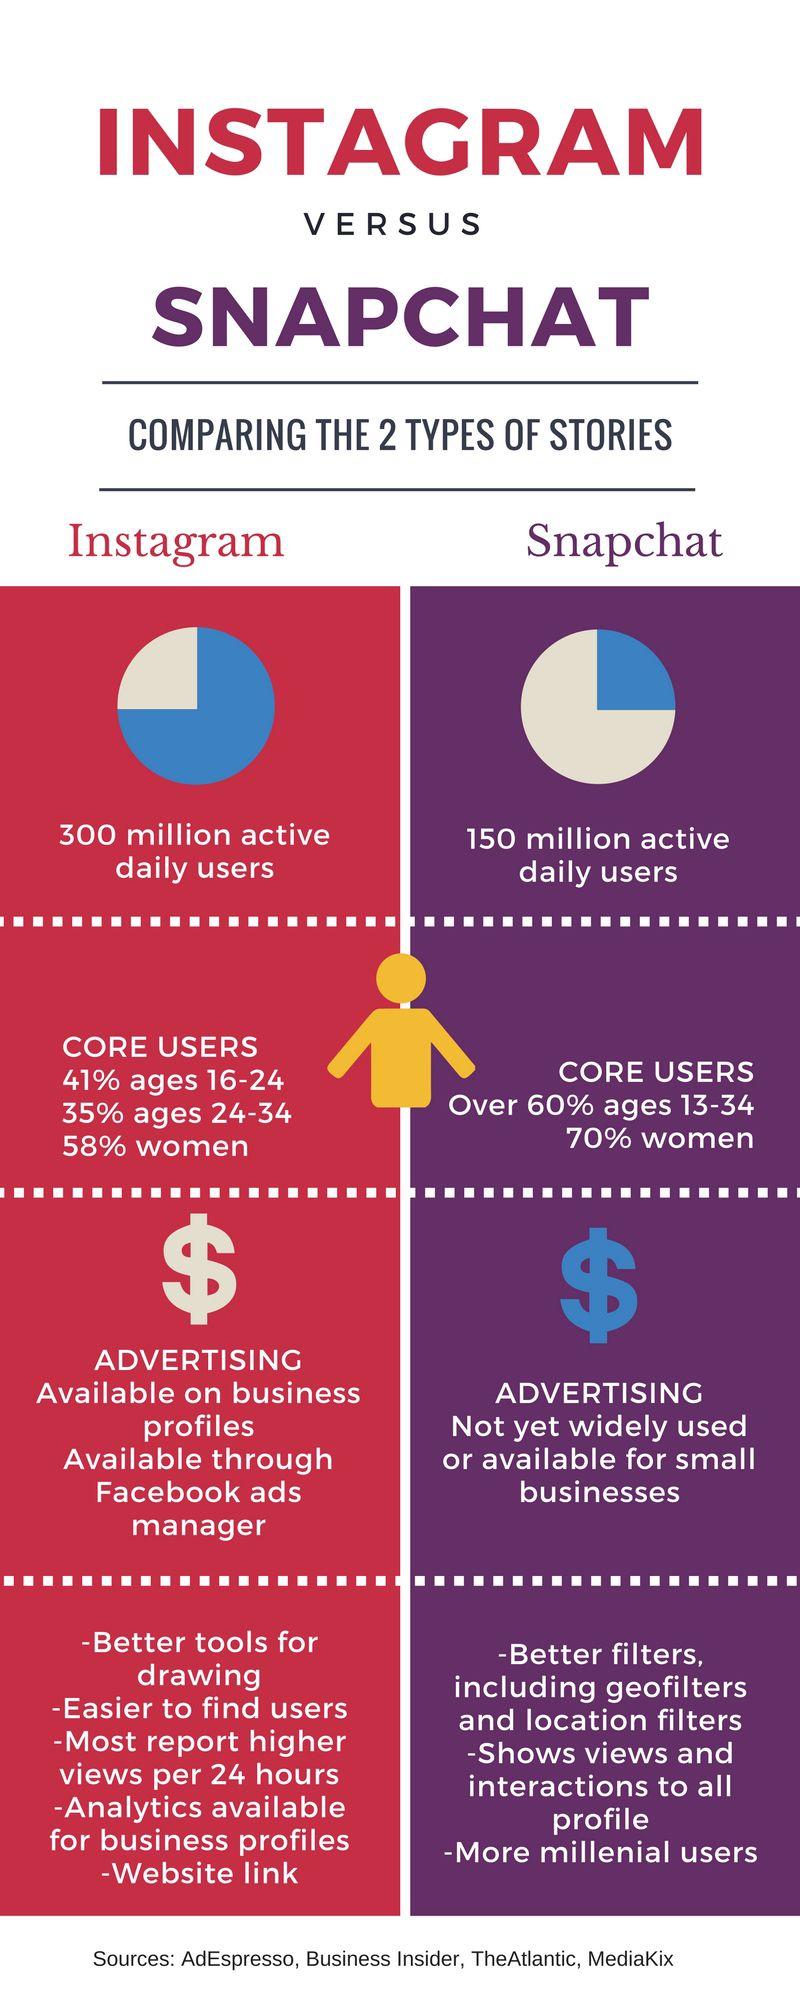 Instagram stories vs snapchat stories an infographic comparison instagram stories vs snapchat stories an infographic comparison ccuart Image collections